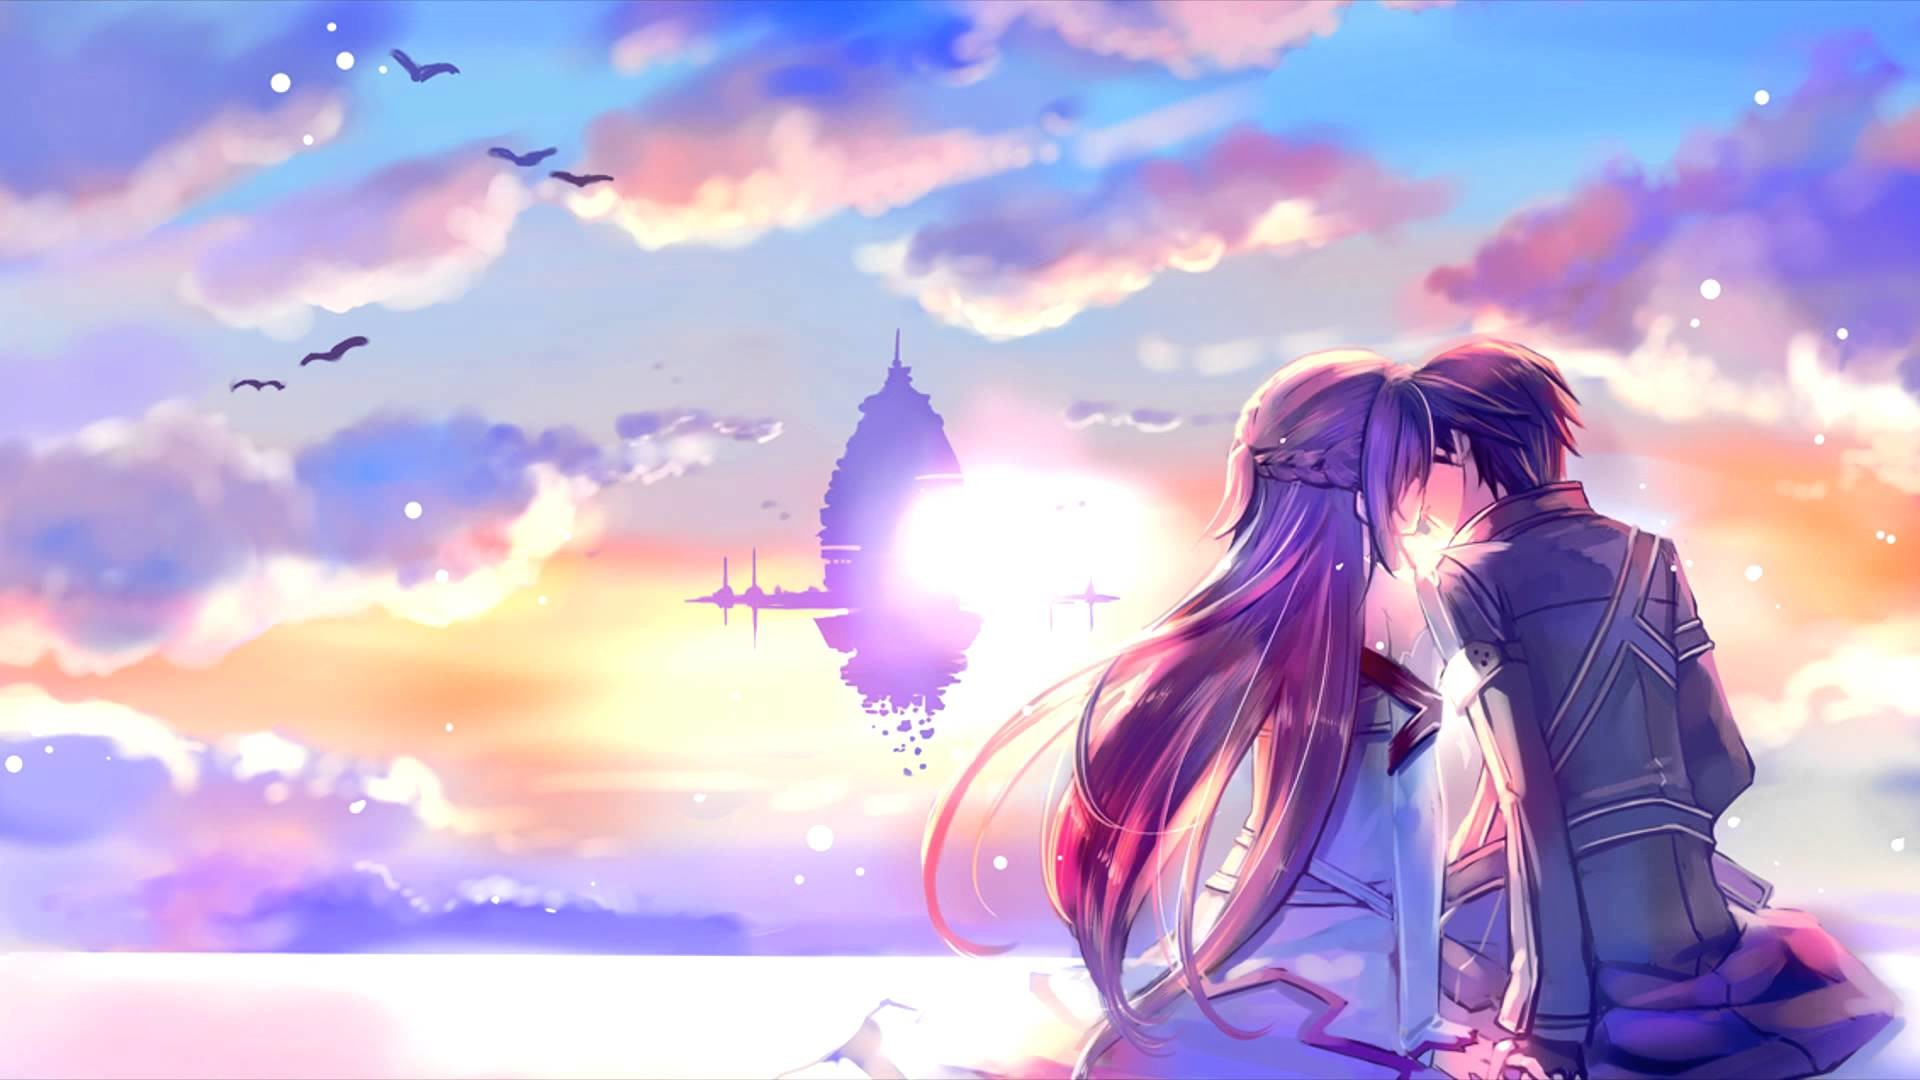 romantic anime wallpaper ·①